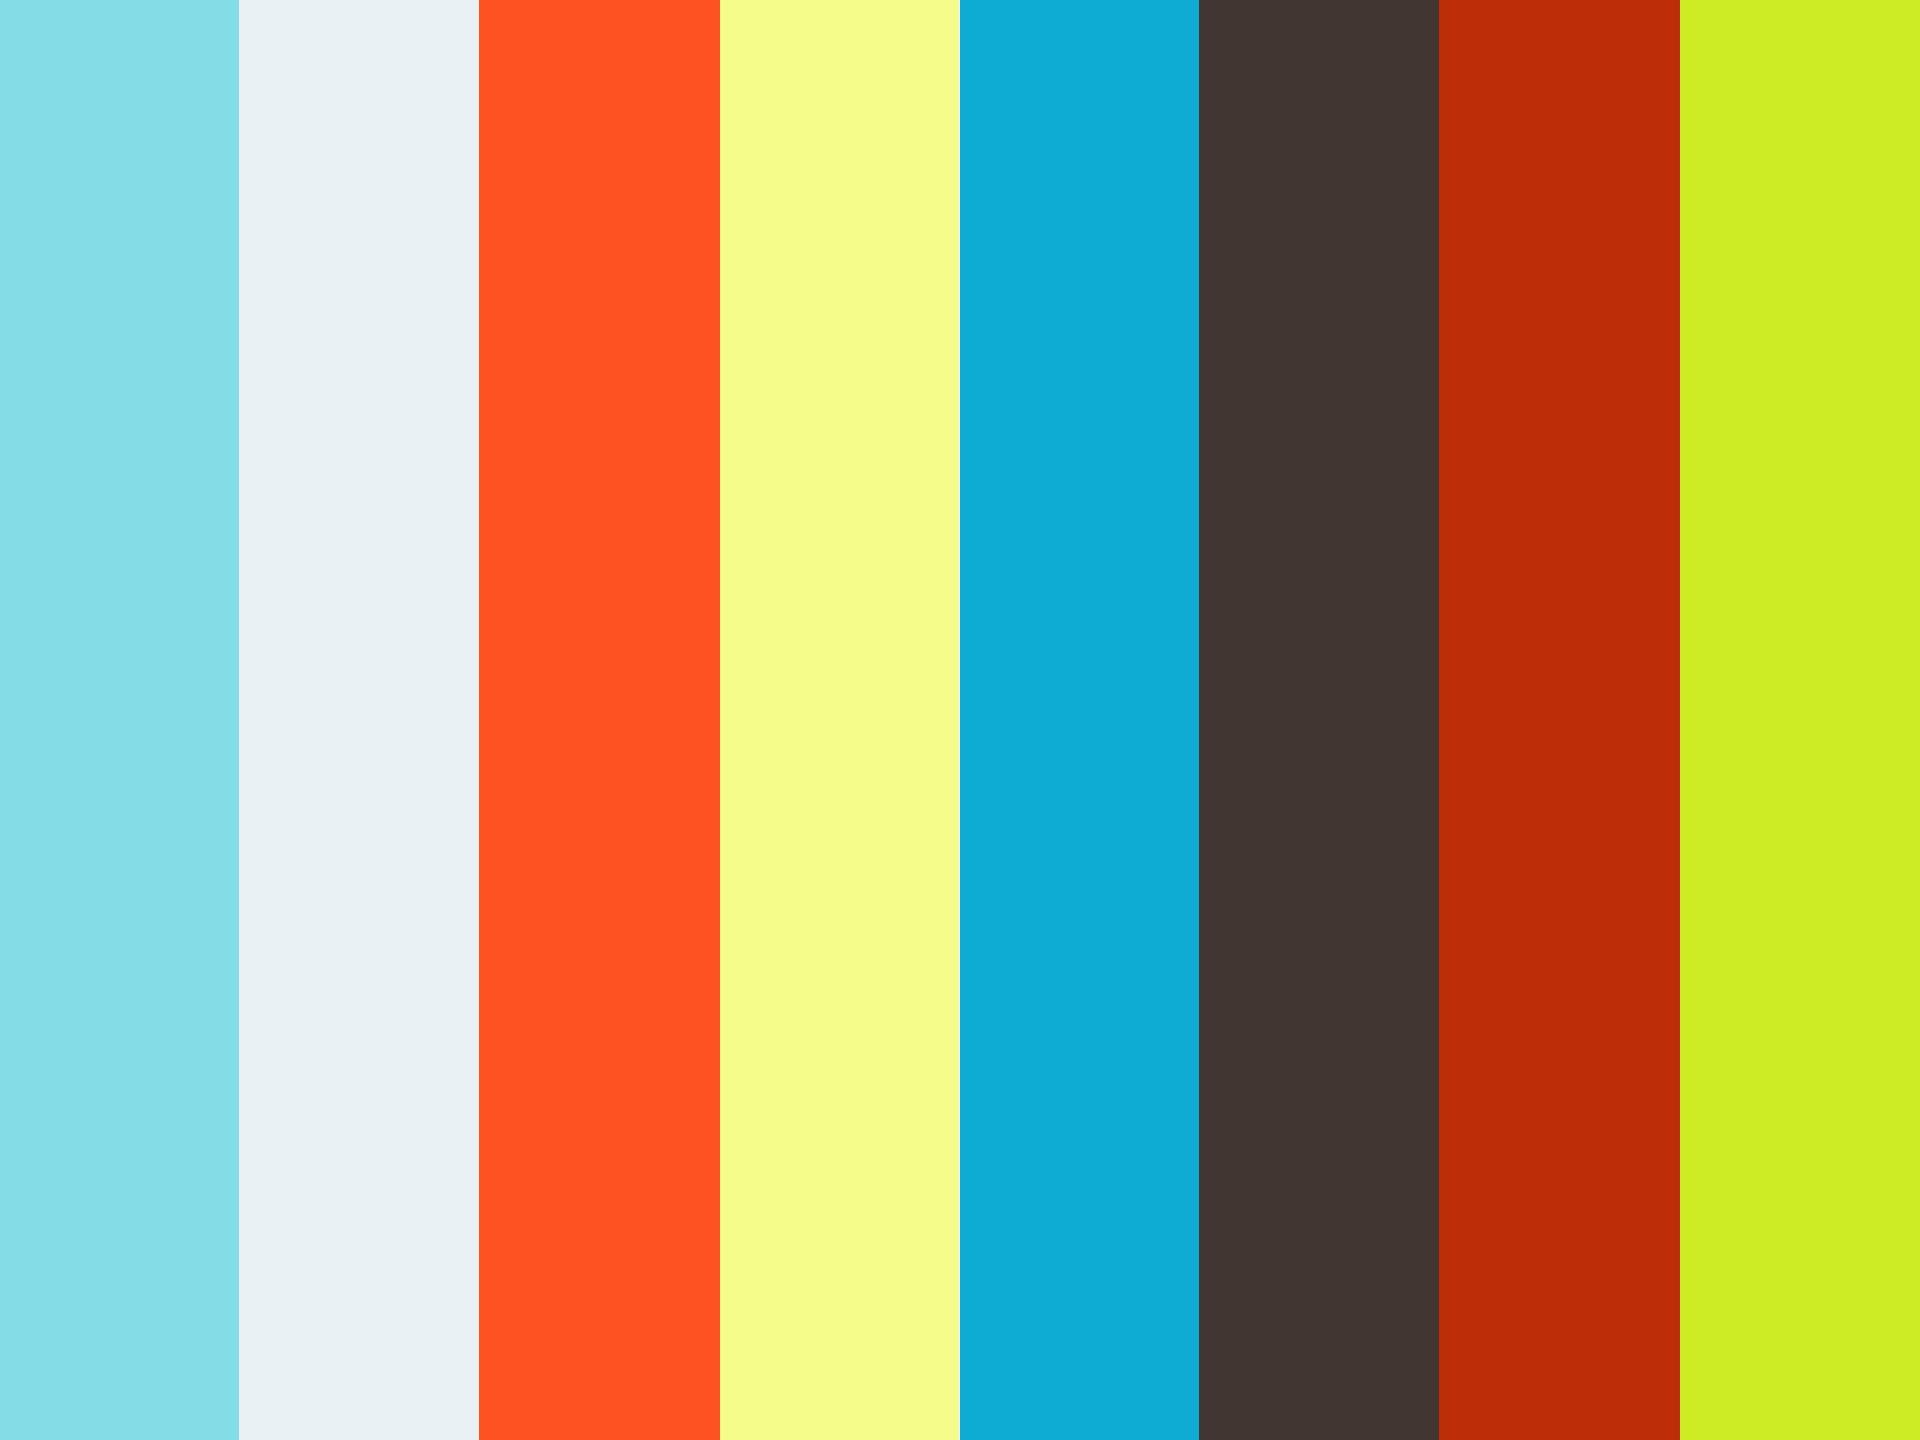 Desktop 3d Live Wallpaper Warm Neon Birth On Vimeo